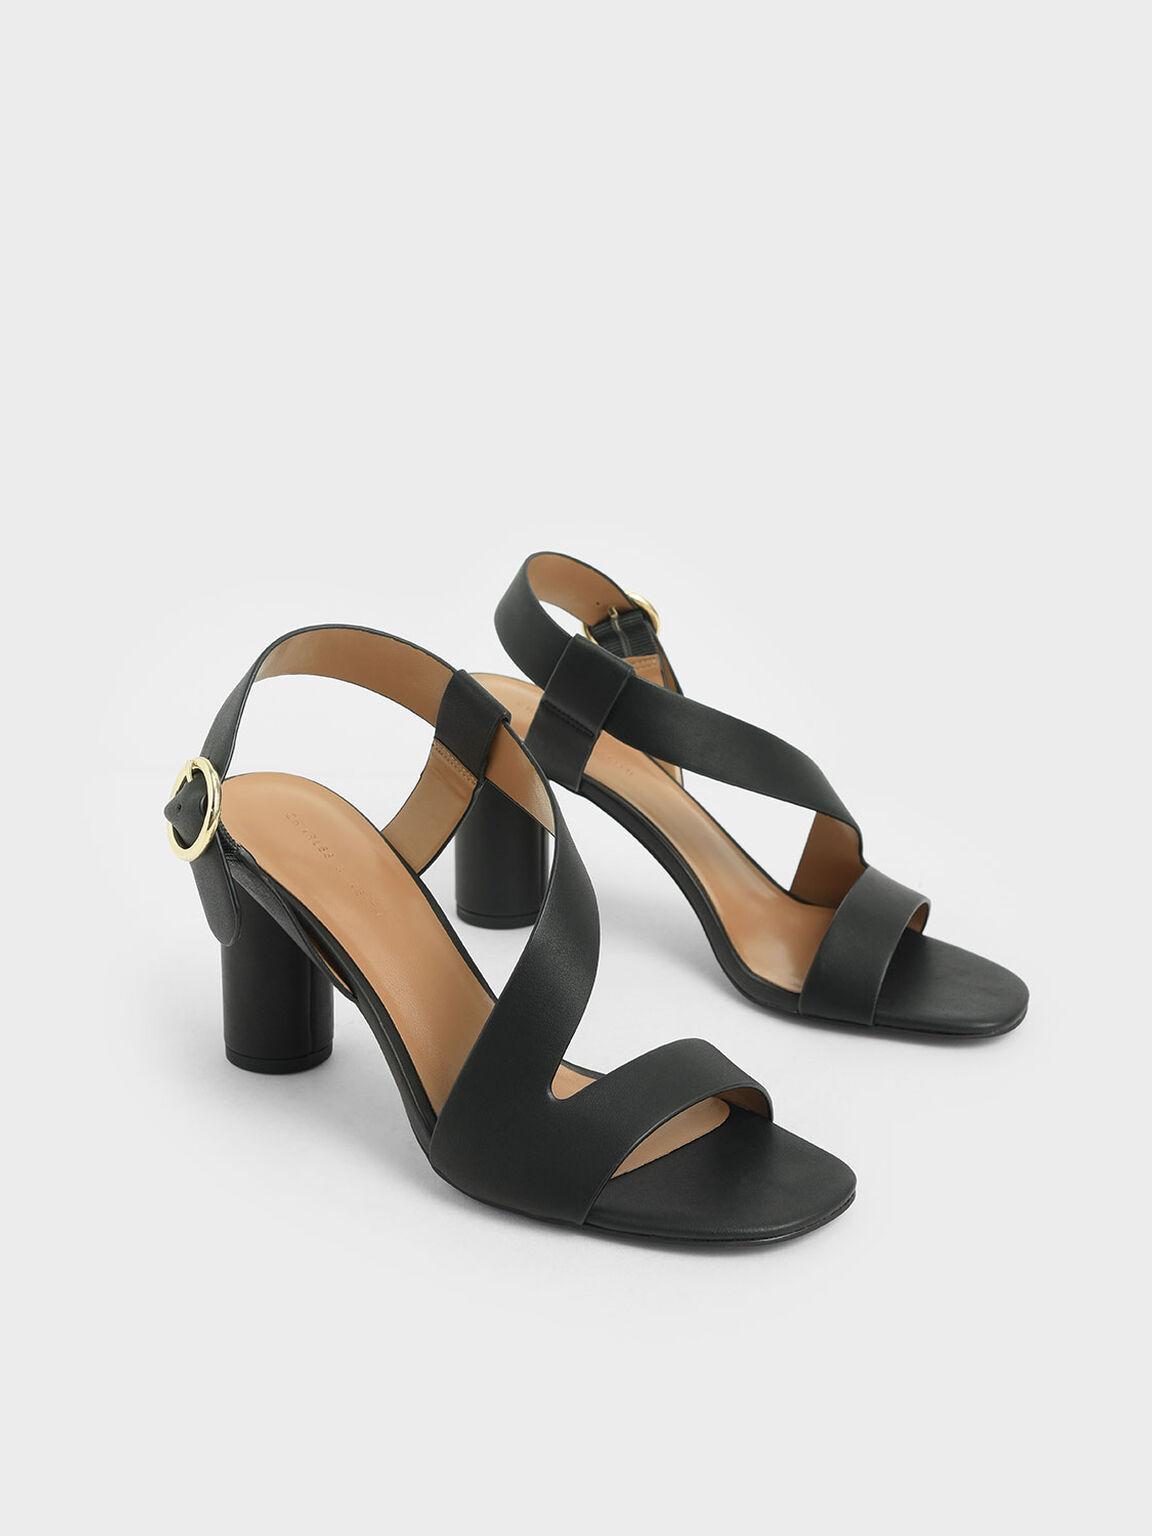 Asymmetric Strap Heeled Sandals, Black, hi-res